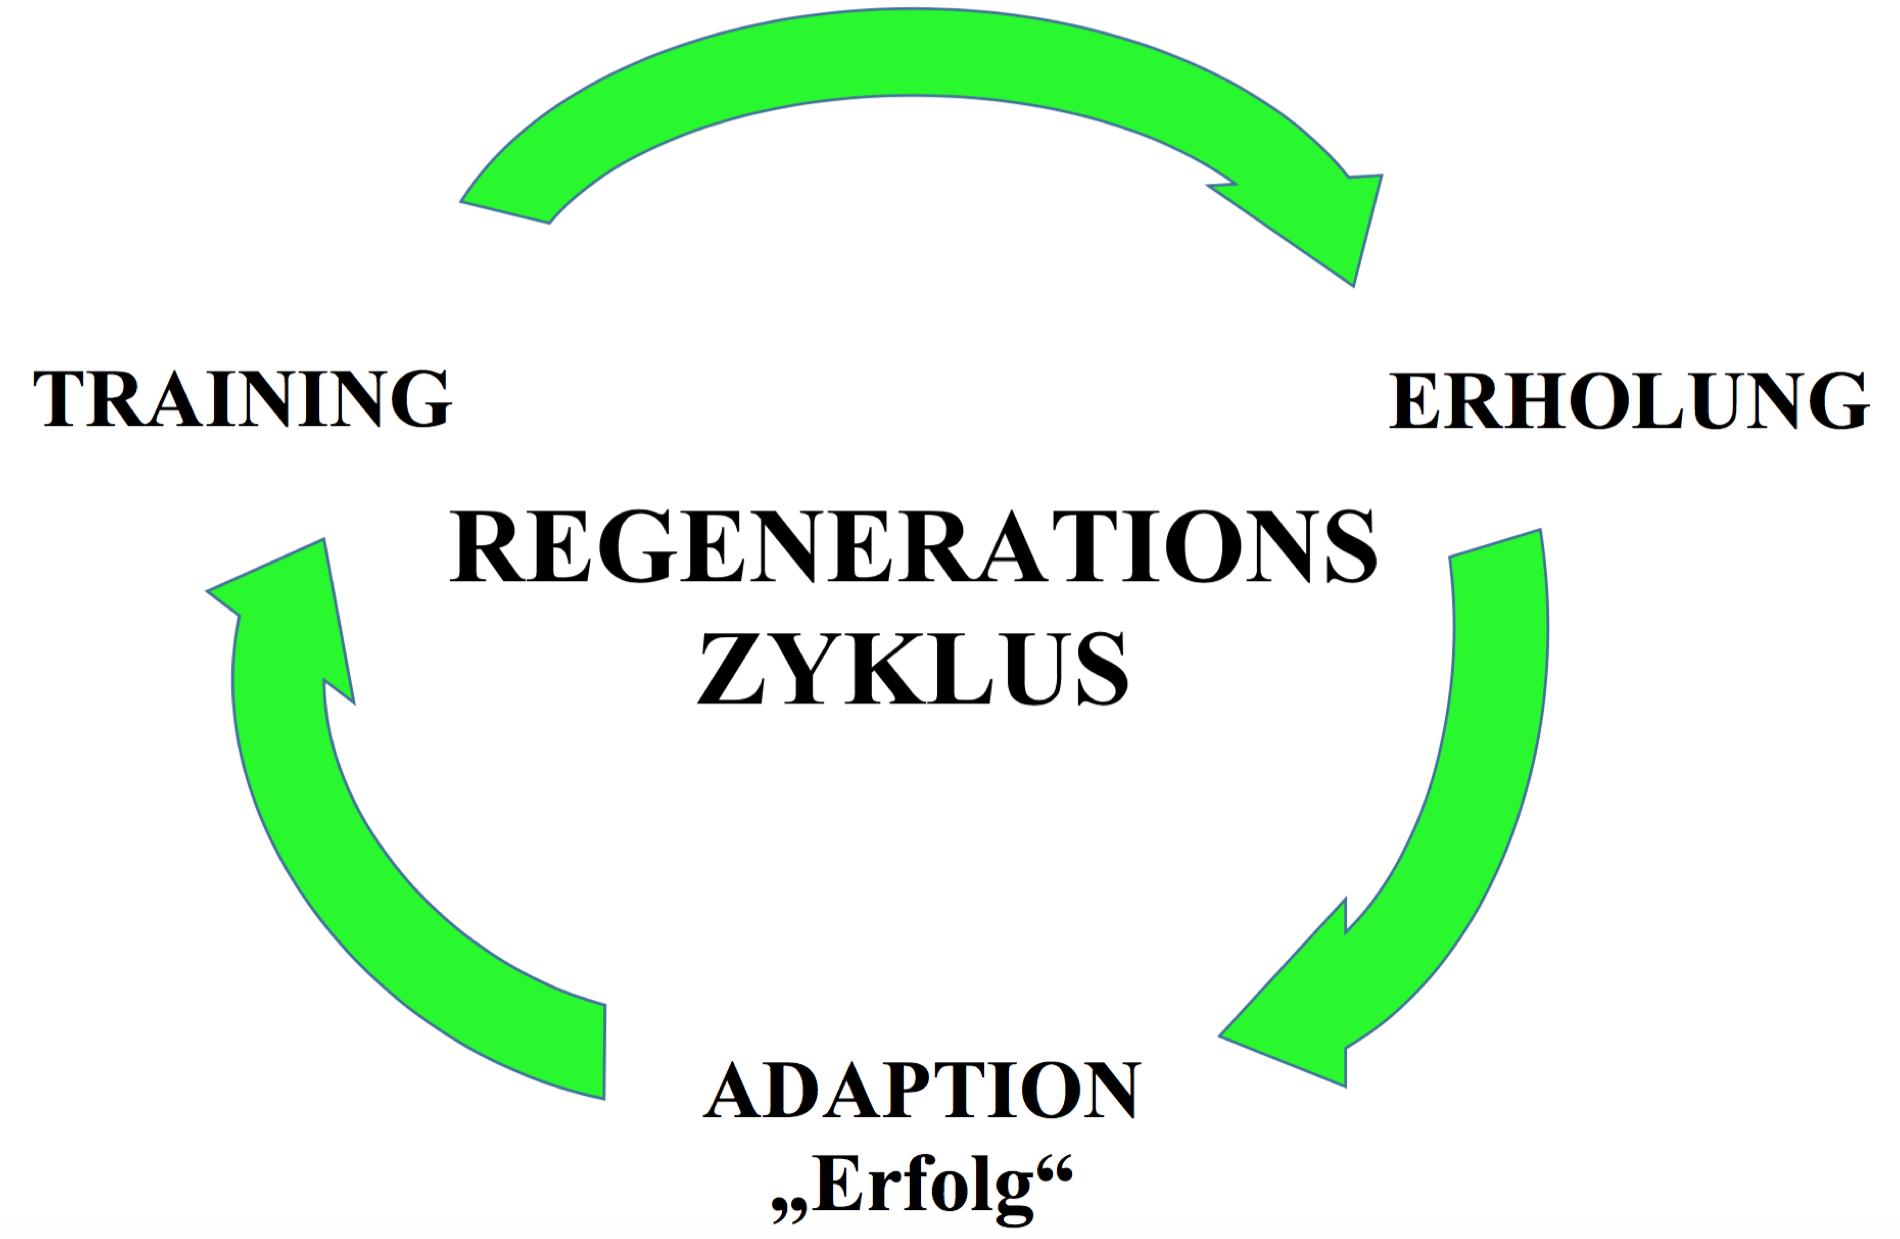 REG ZYKLUS